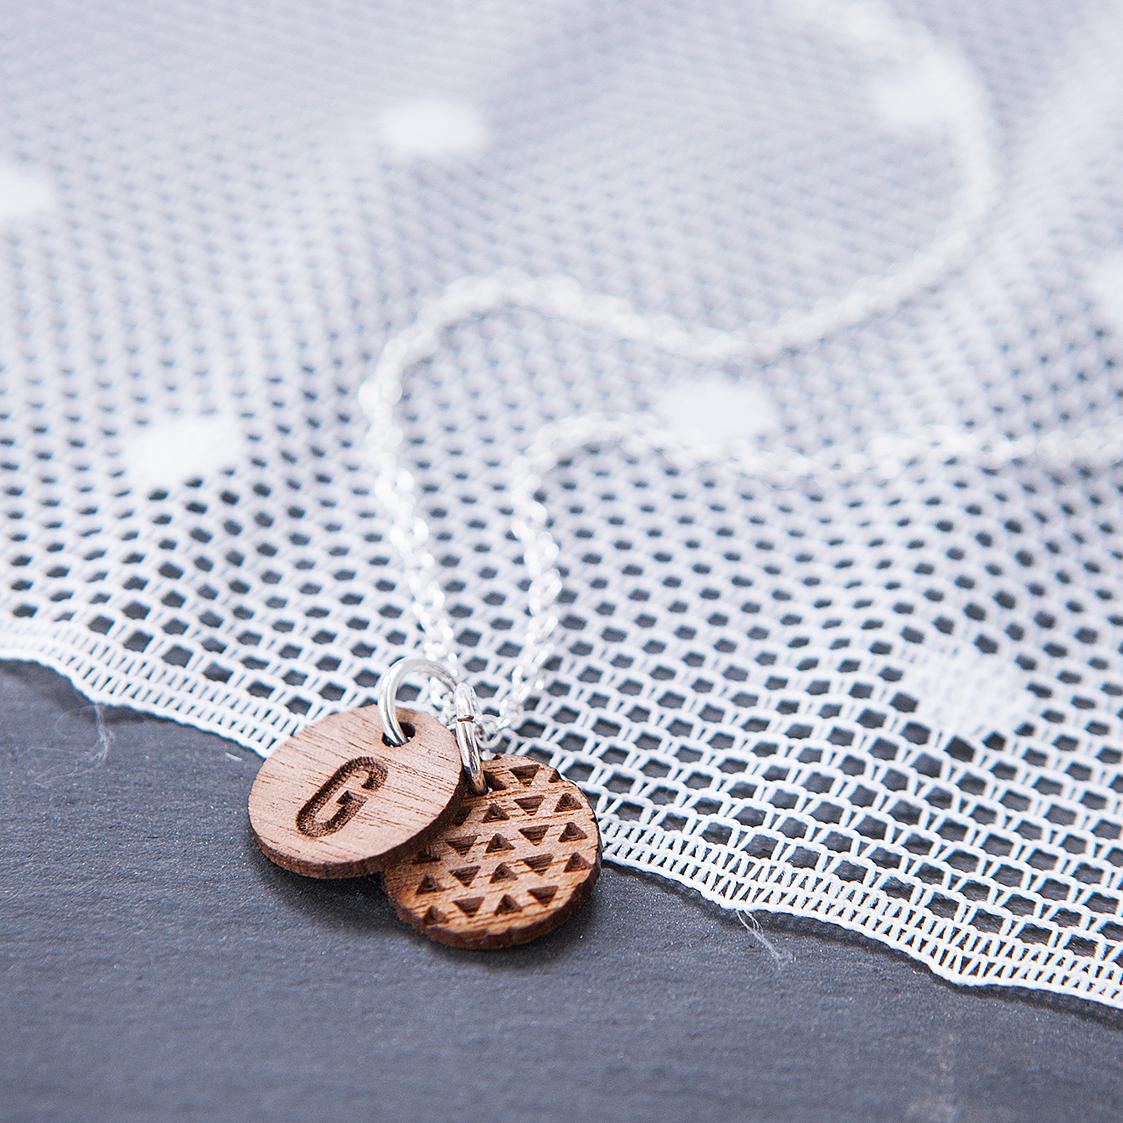 Necklace_G.jpg